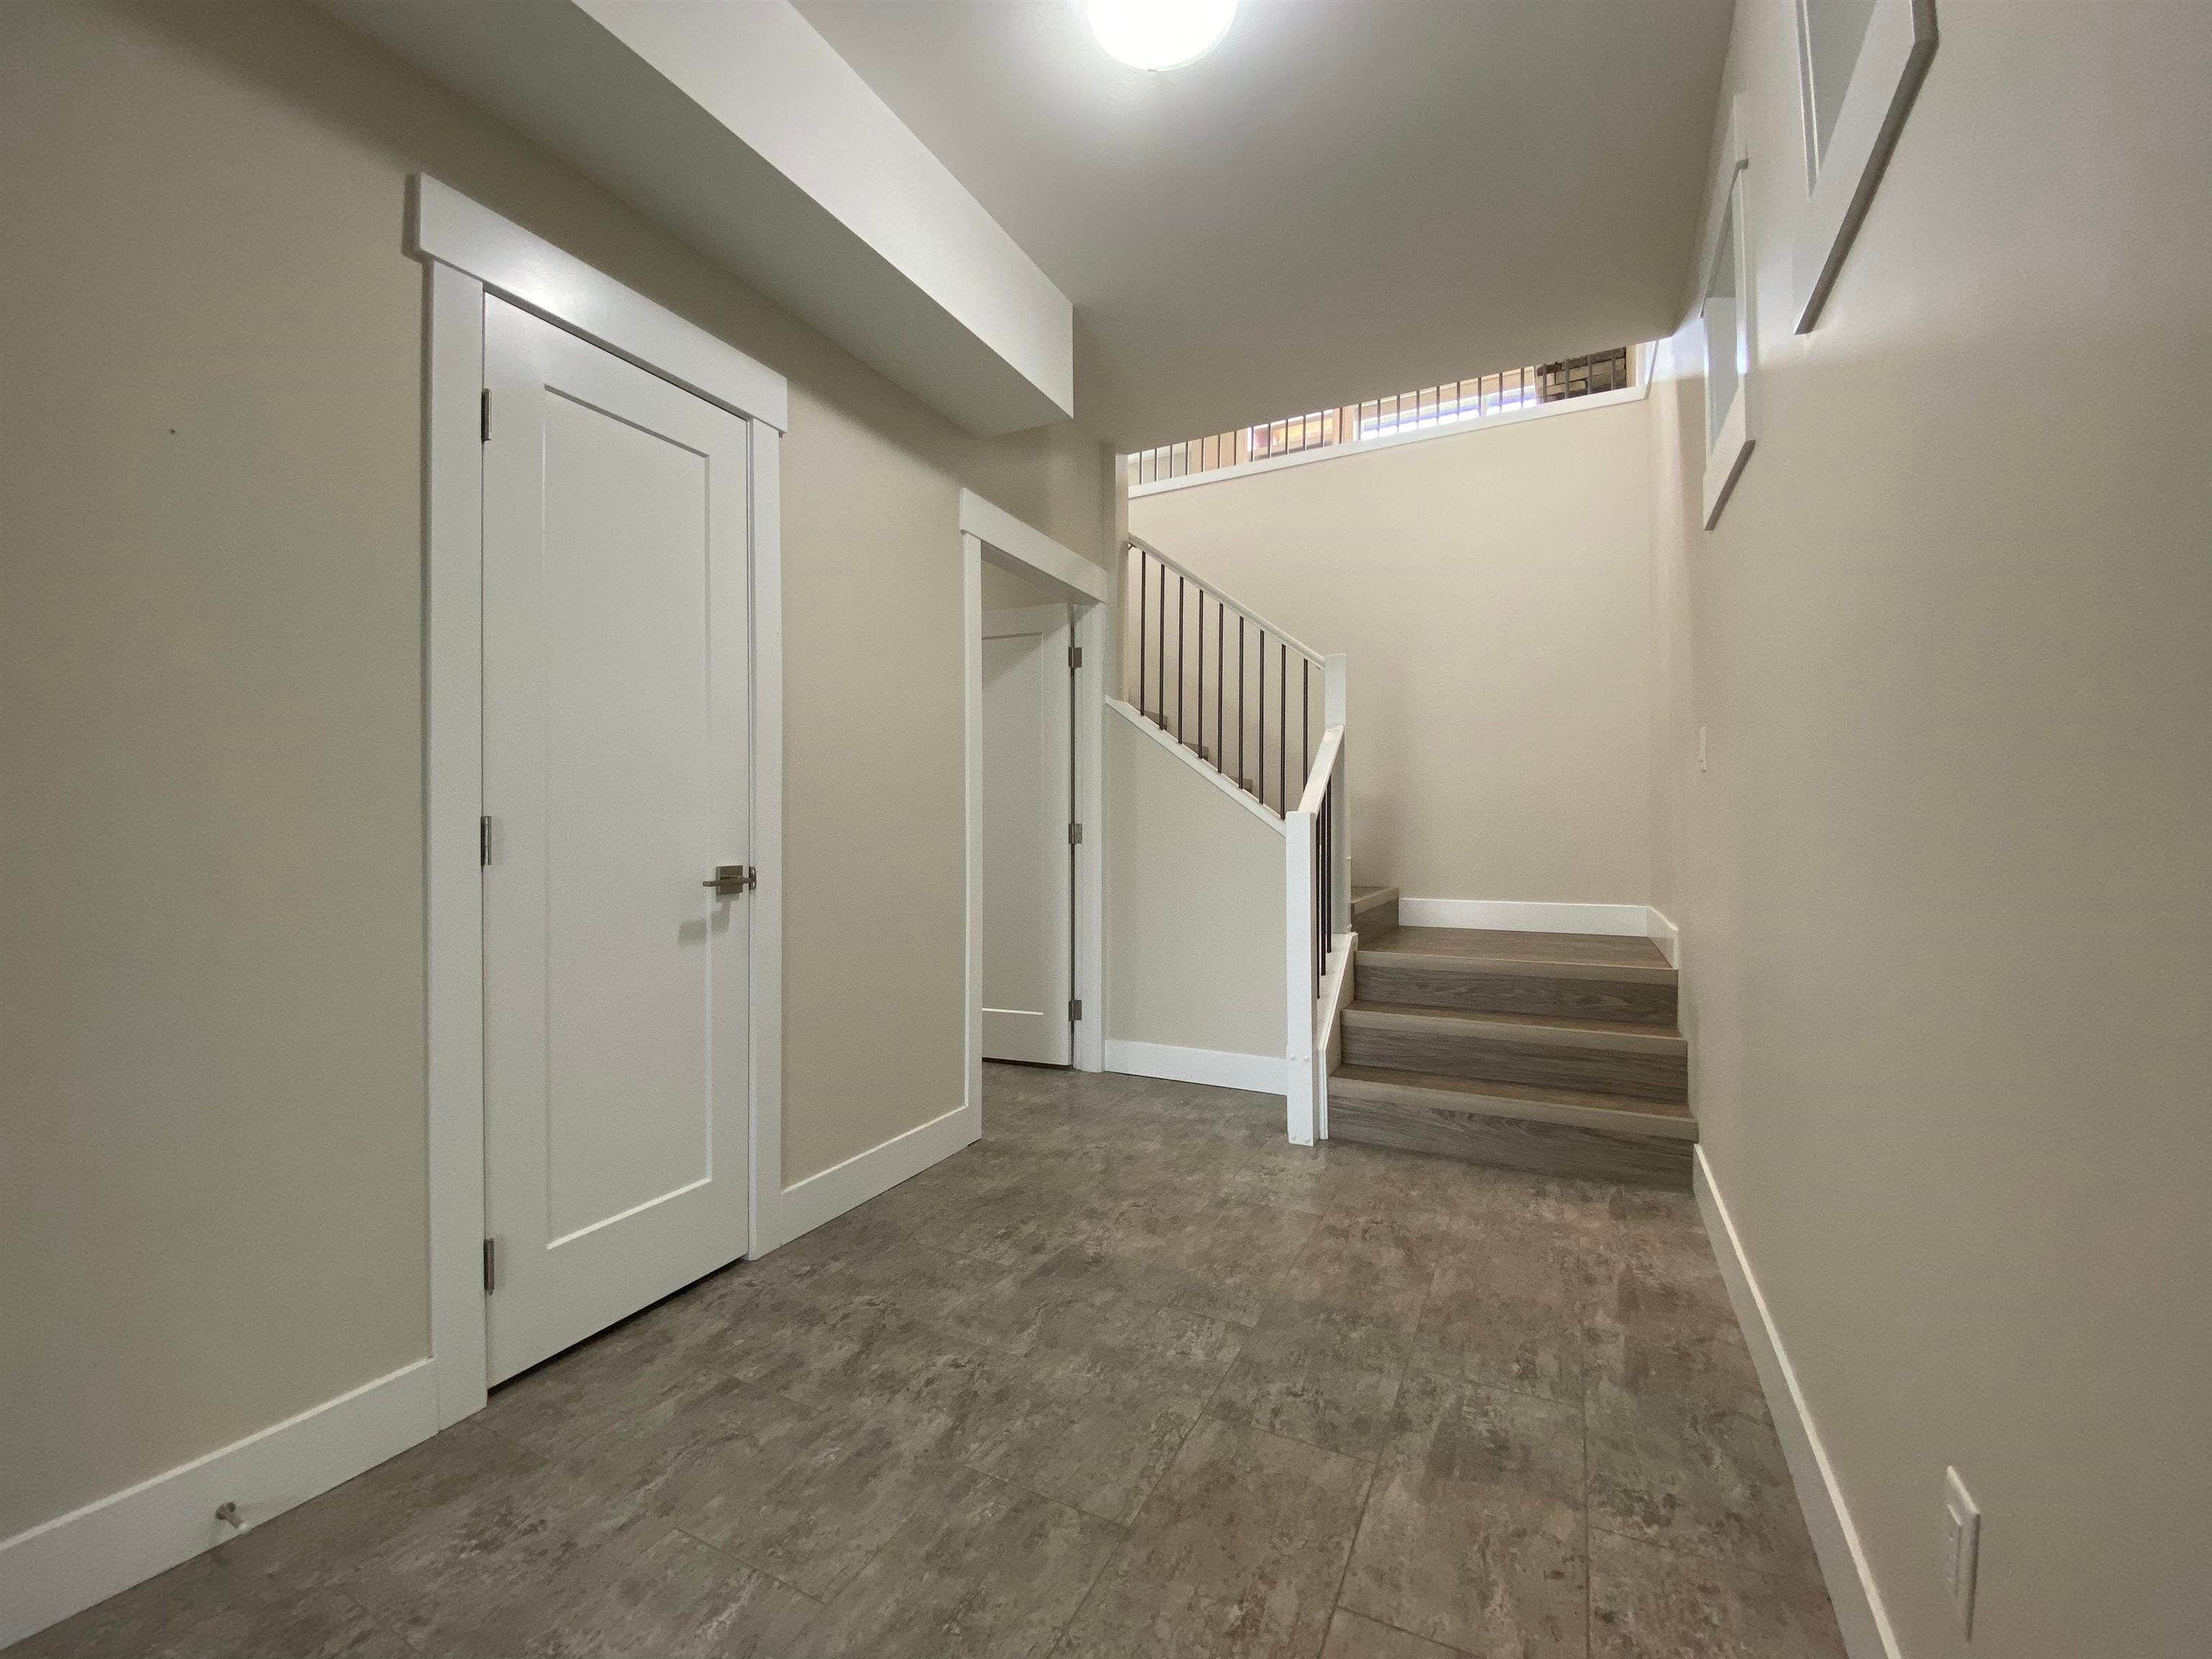 10144 KILLARNEY DRIVE - Fairfield Island House/Single Family for sale, 5 Bedrooms (R2625716) - #8